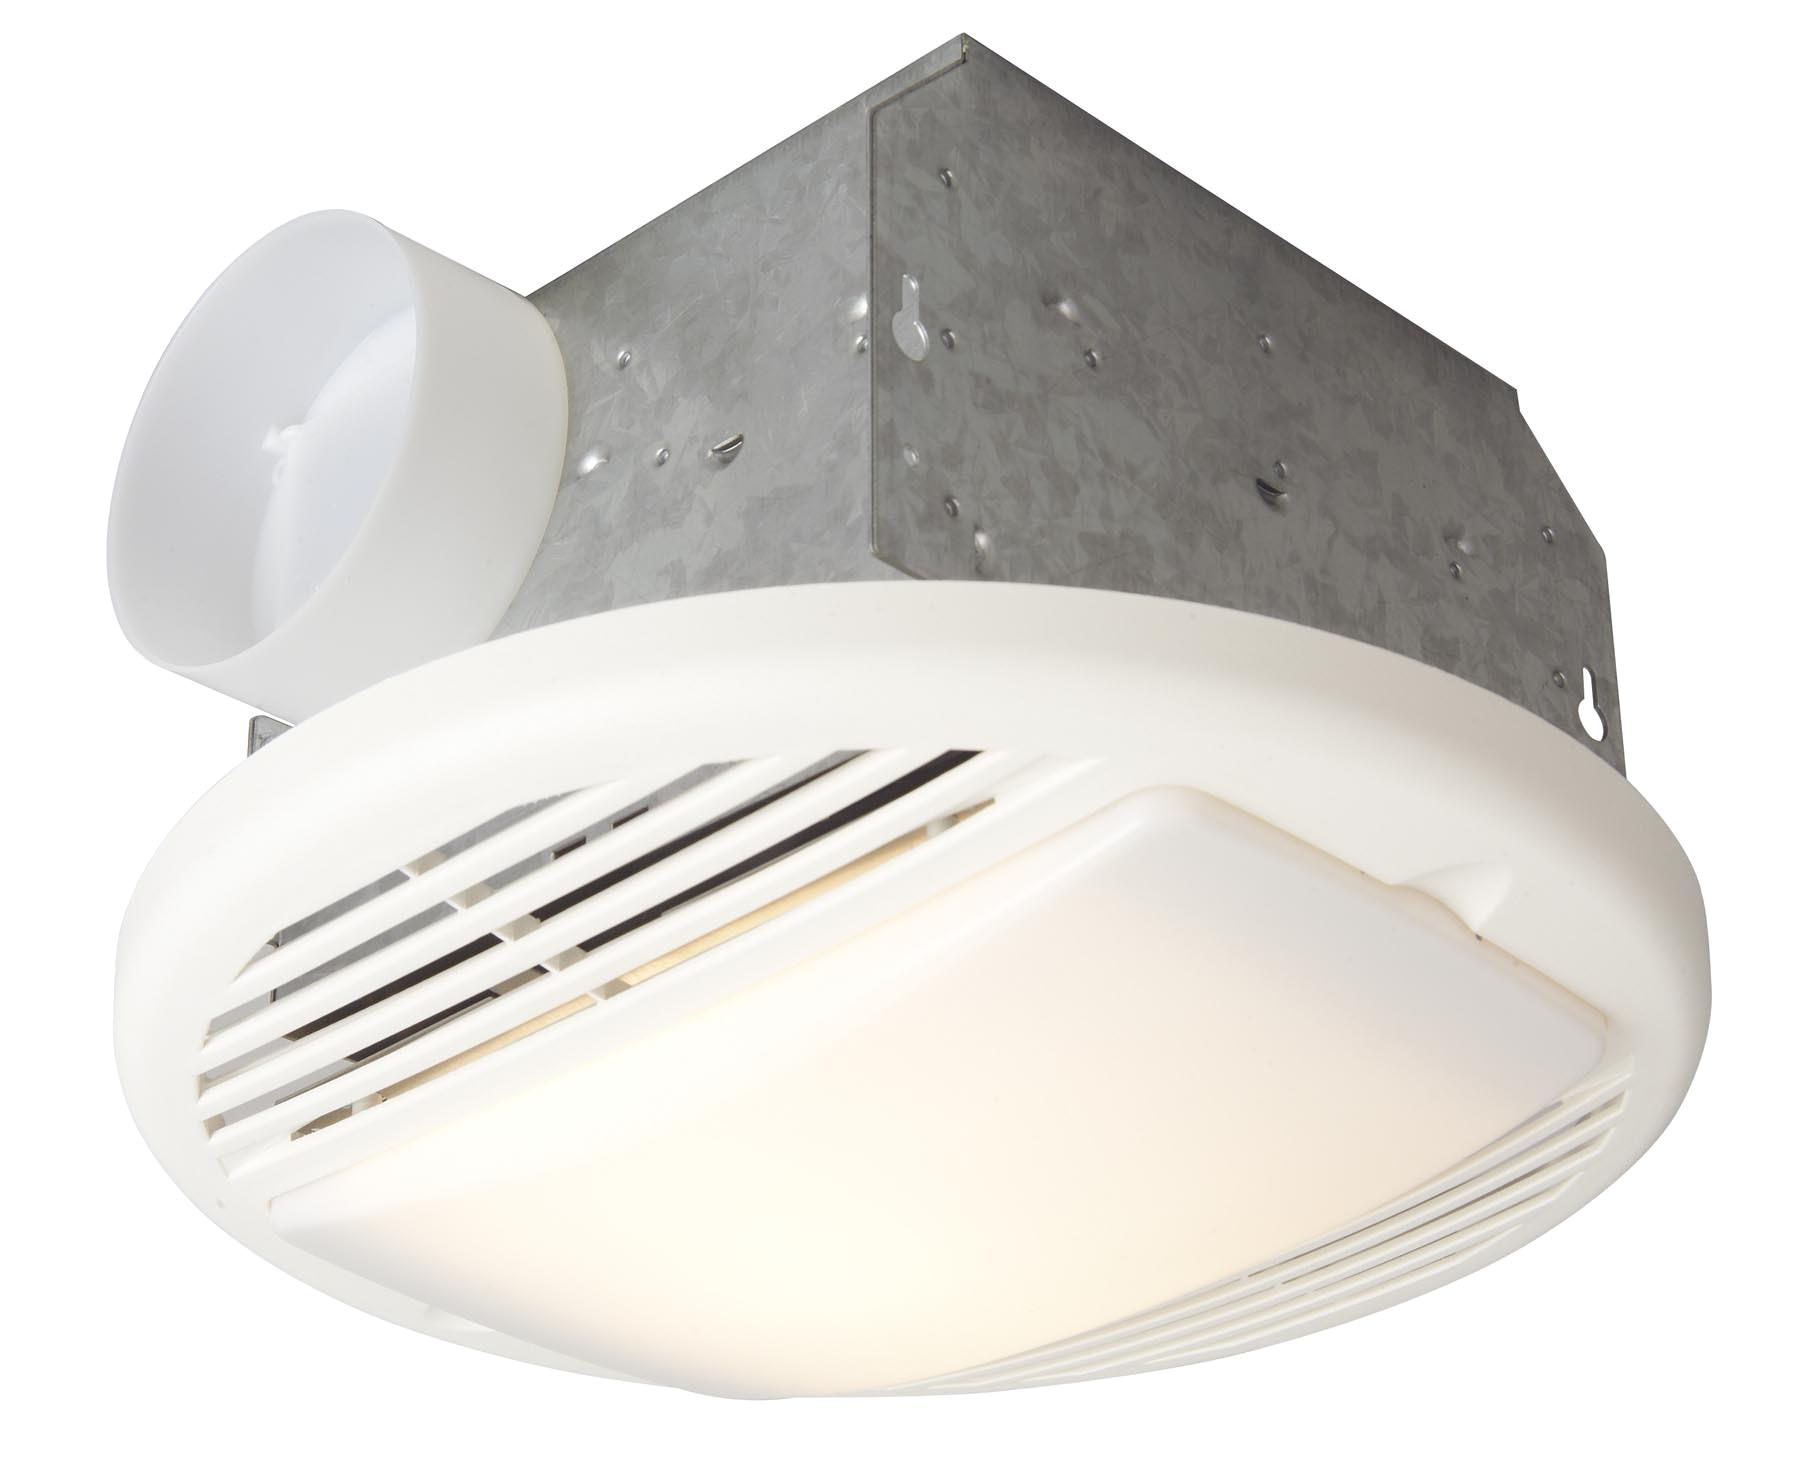 Freestanding Bathroom Exhaust Fan 70 Cfm Bathroom Exhaust Fan Light Designer White Tfv70l